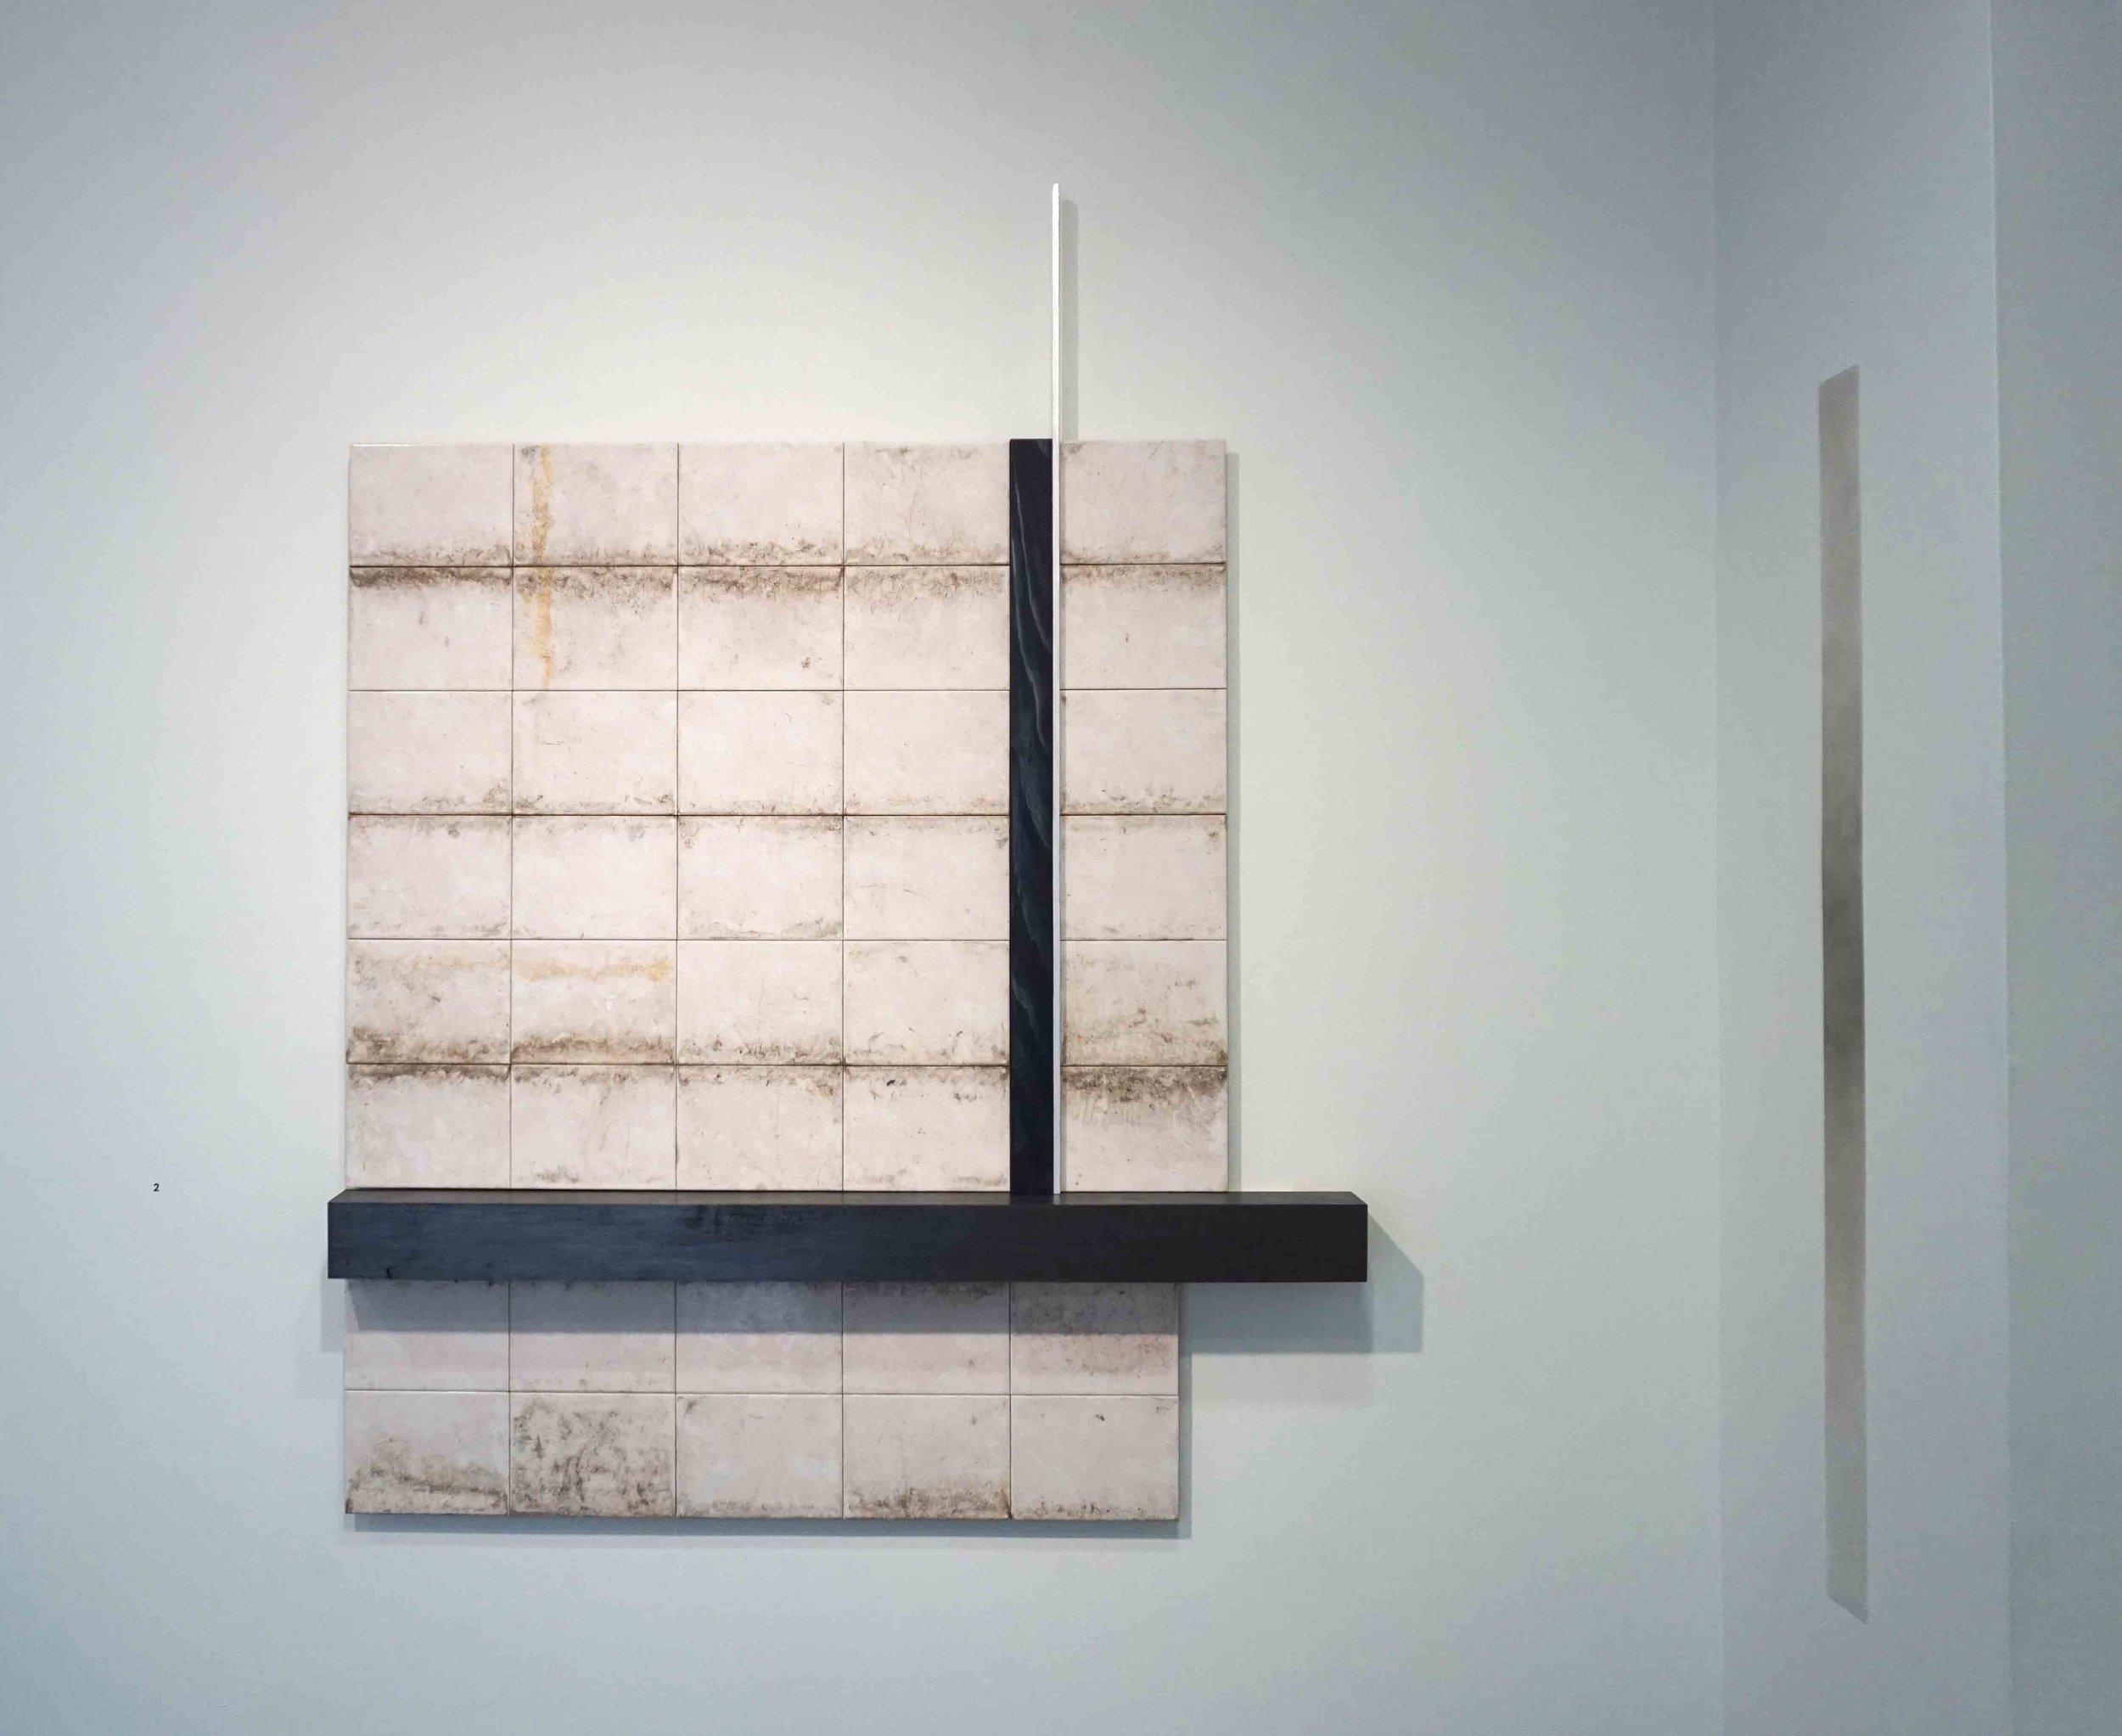 2. Penny Coss and Benjamin Bannan, P arallel States , 2019, ceramic tiles, wood, mica powder, graphite powder, ash and indigo pigment on aluminium, 130 x 120 cm $1,800